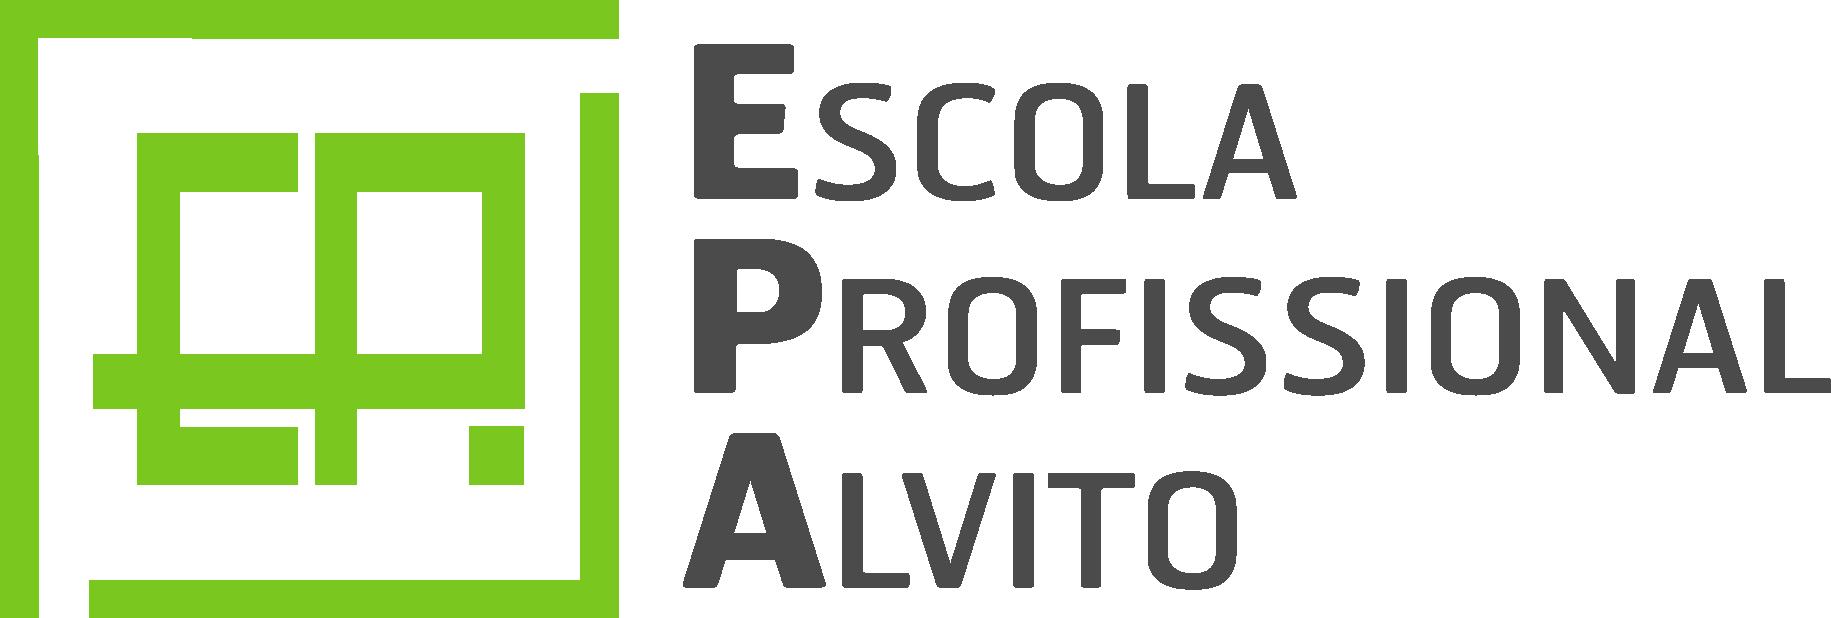 LOGO - EPA